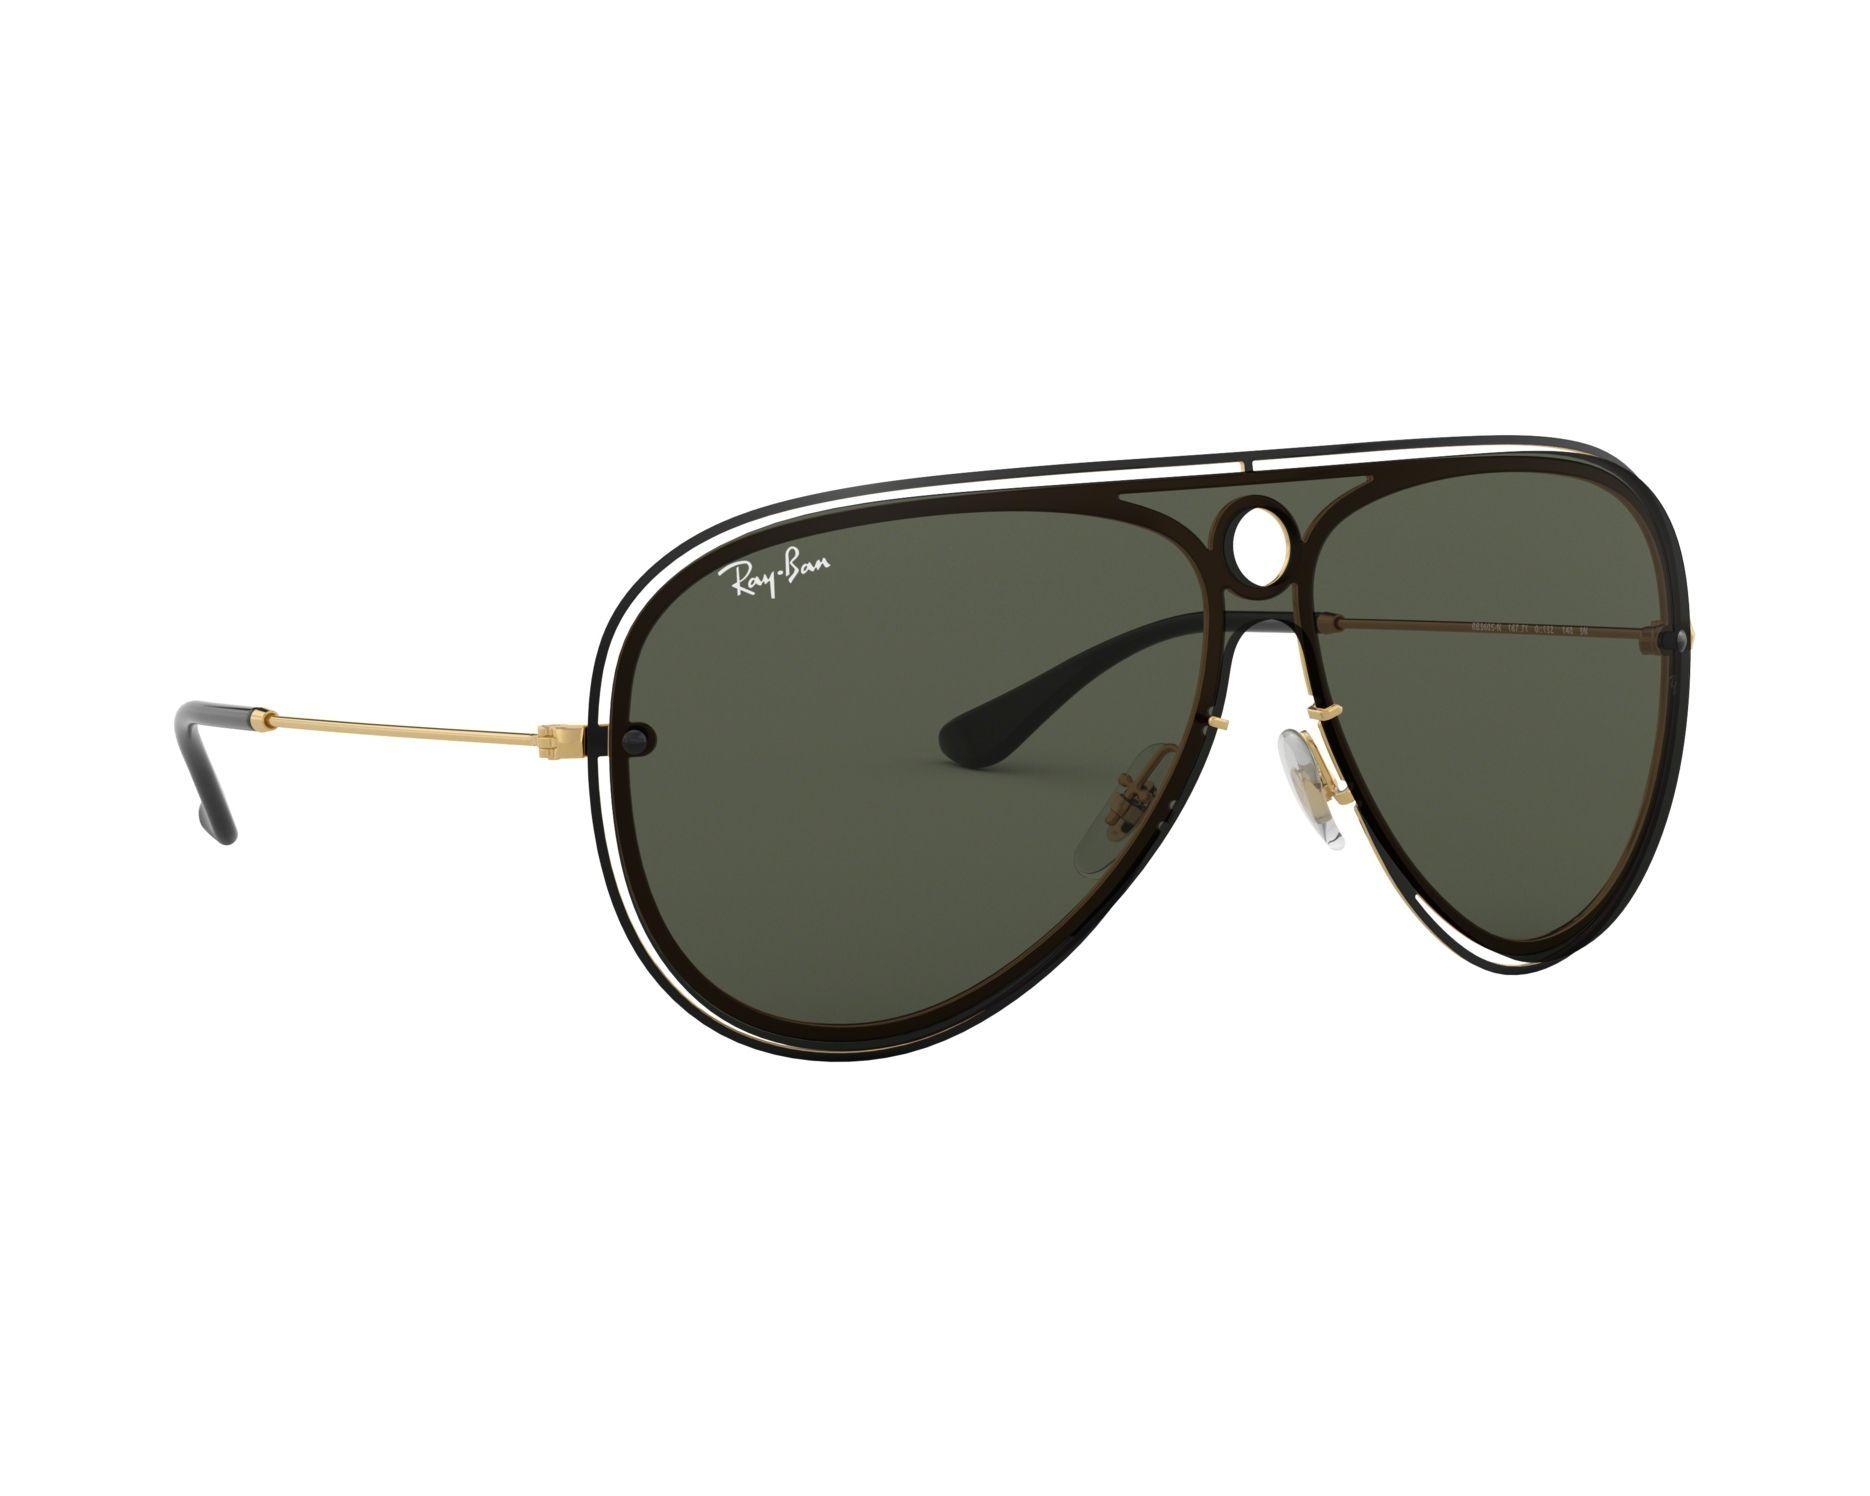 4ee728a74fba Buy Ray-Ban New Ray Ban Sunglasses 3605n 187/71 Green / Gold Aviator